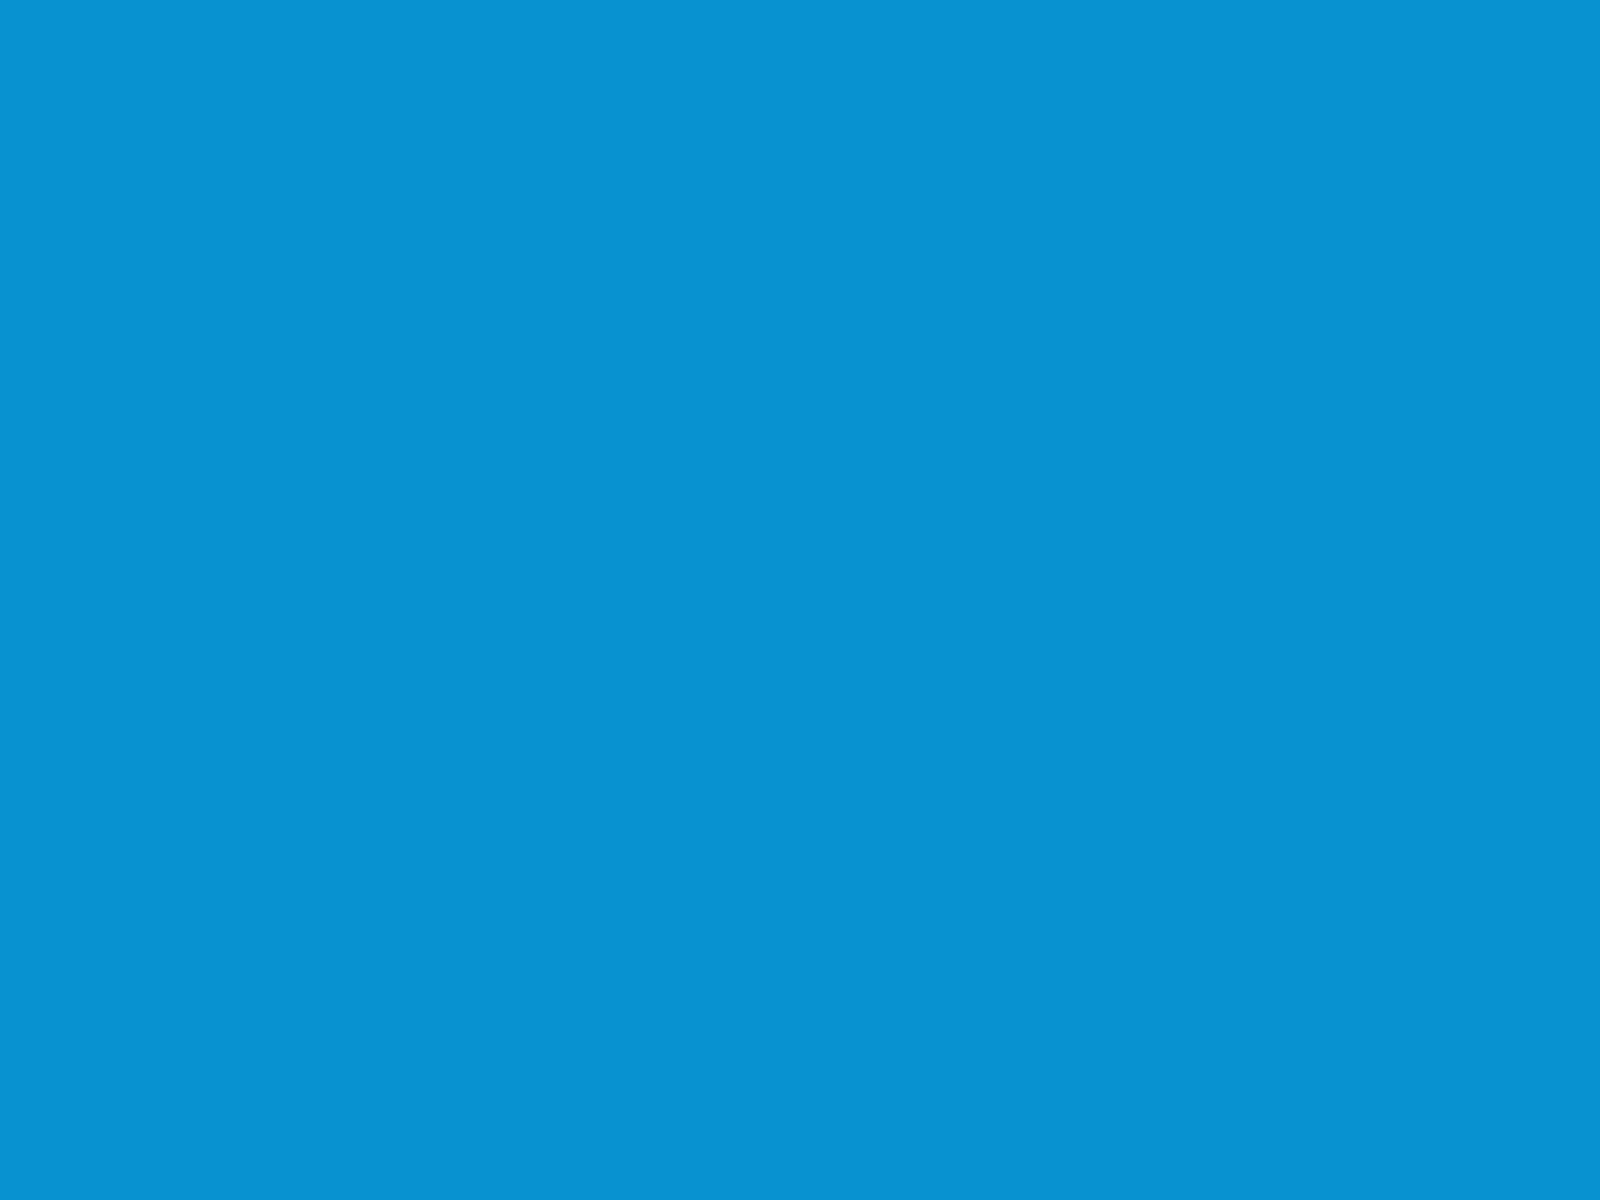 1600x1200 rich electric blue solid color background. Black Bedroom Furniture Sets. Home Design Ideas